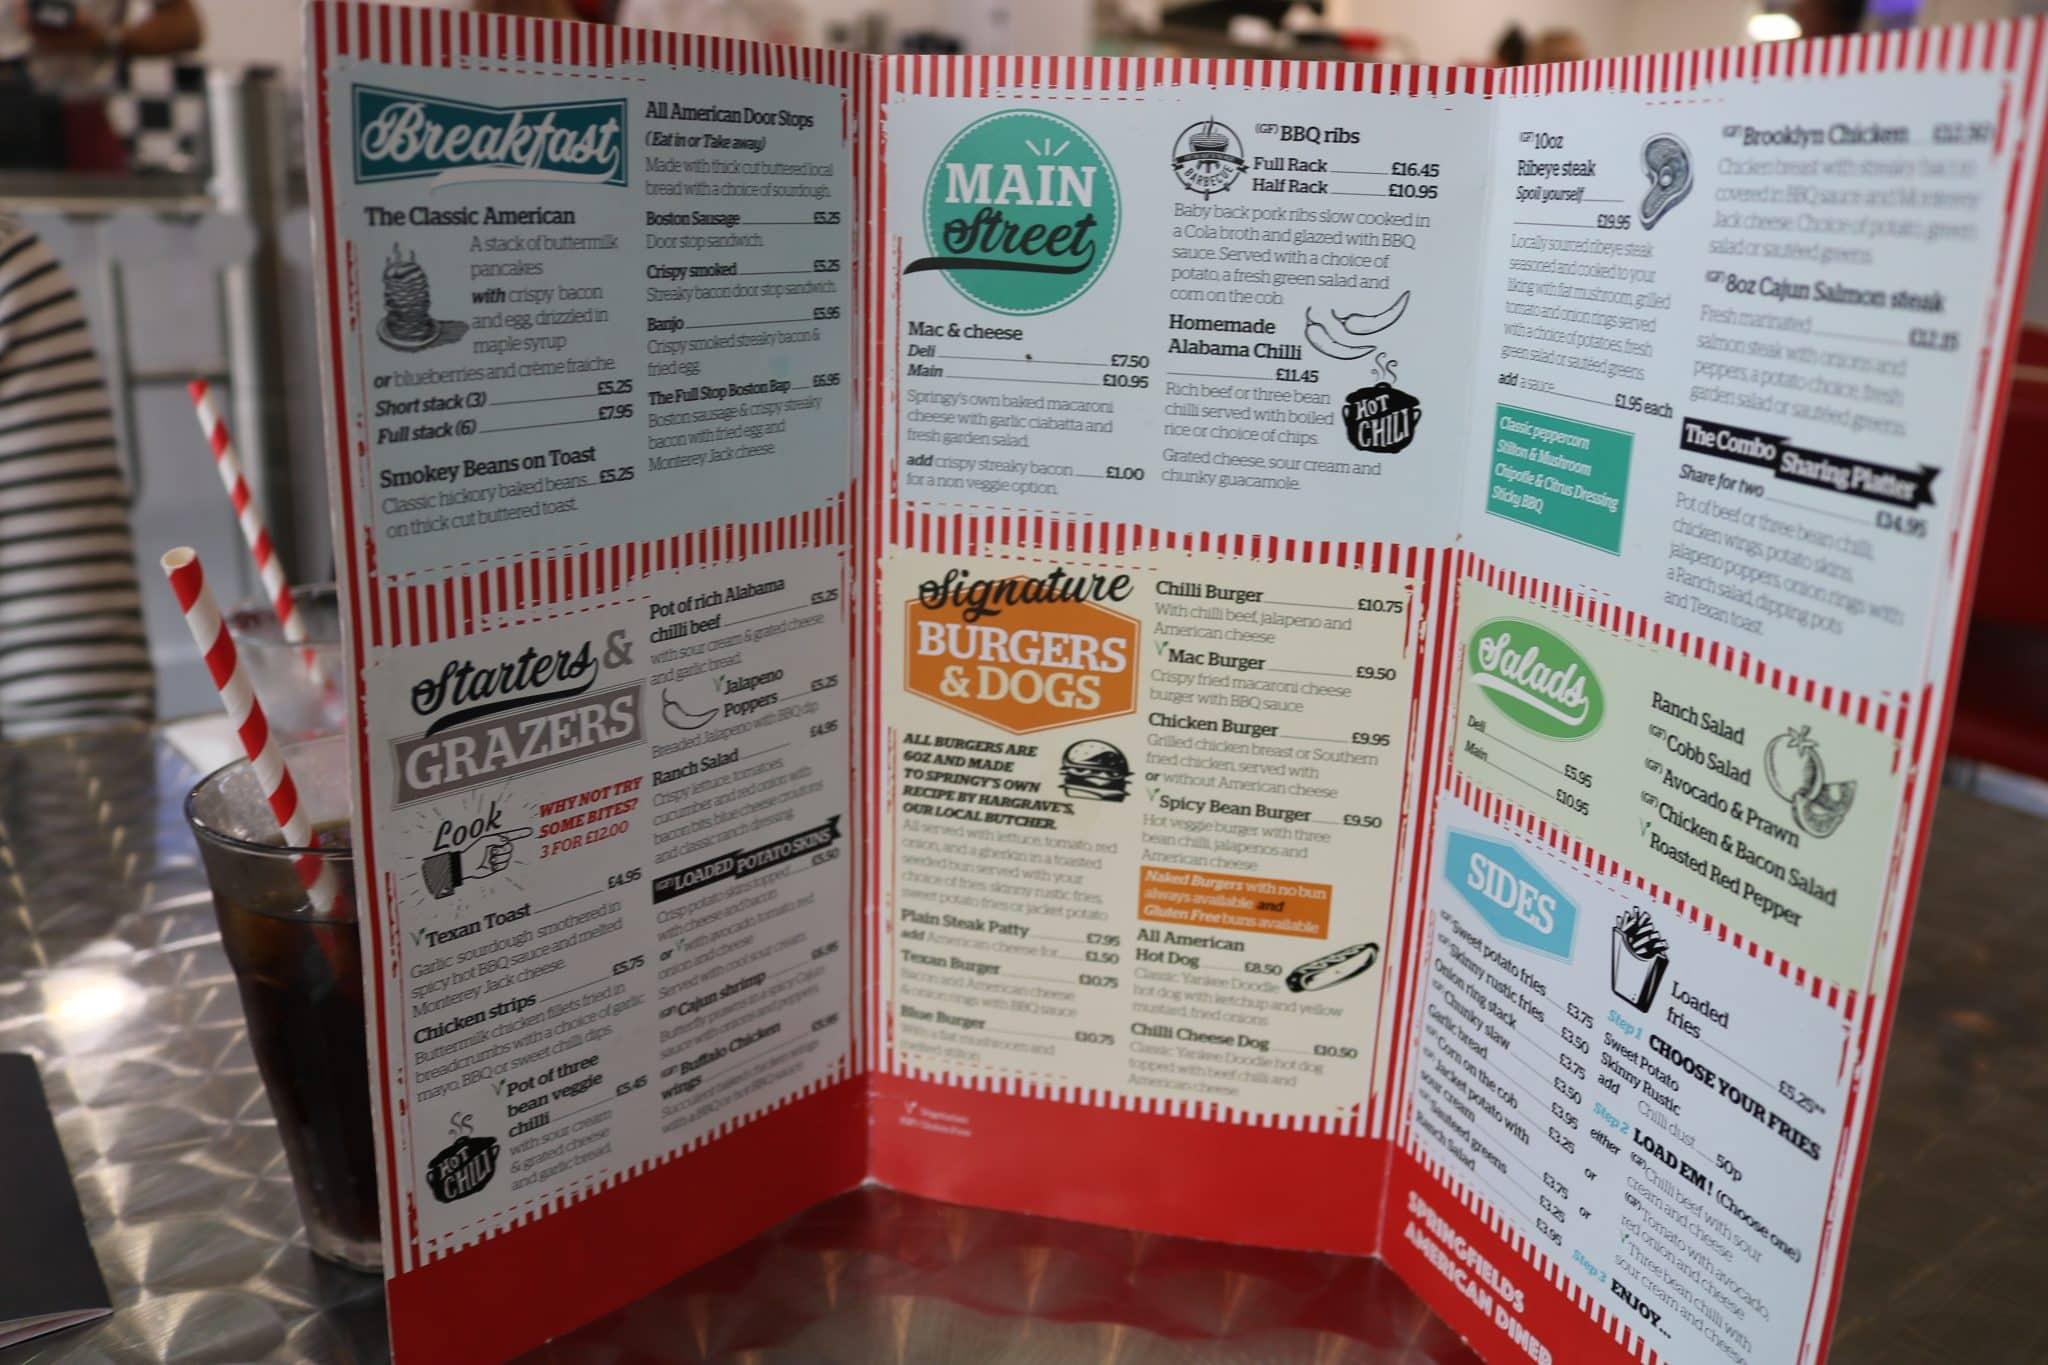 The menu at Springy's Diner